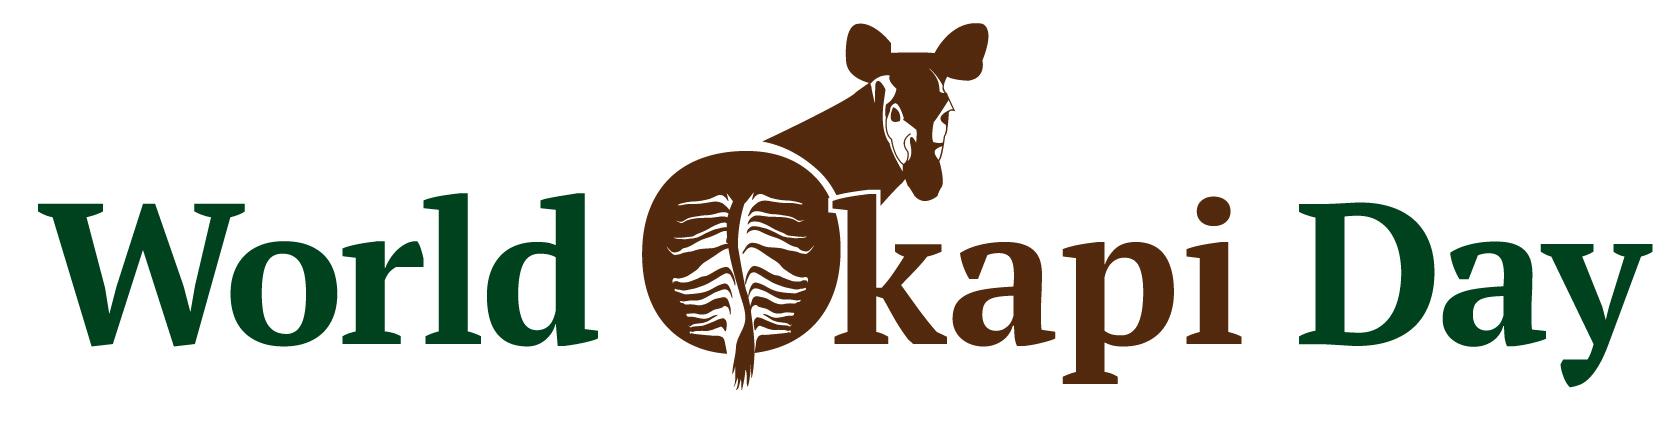 World Okapi Day poster